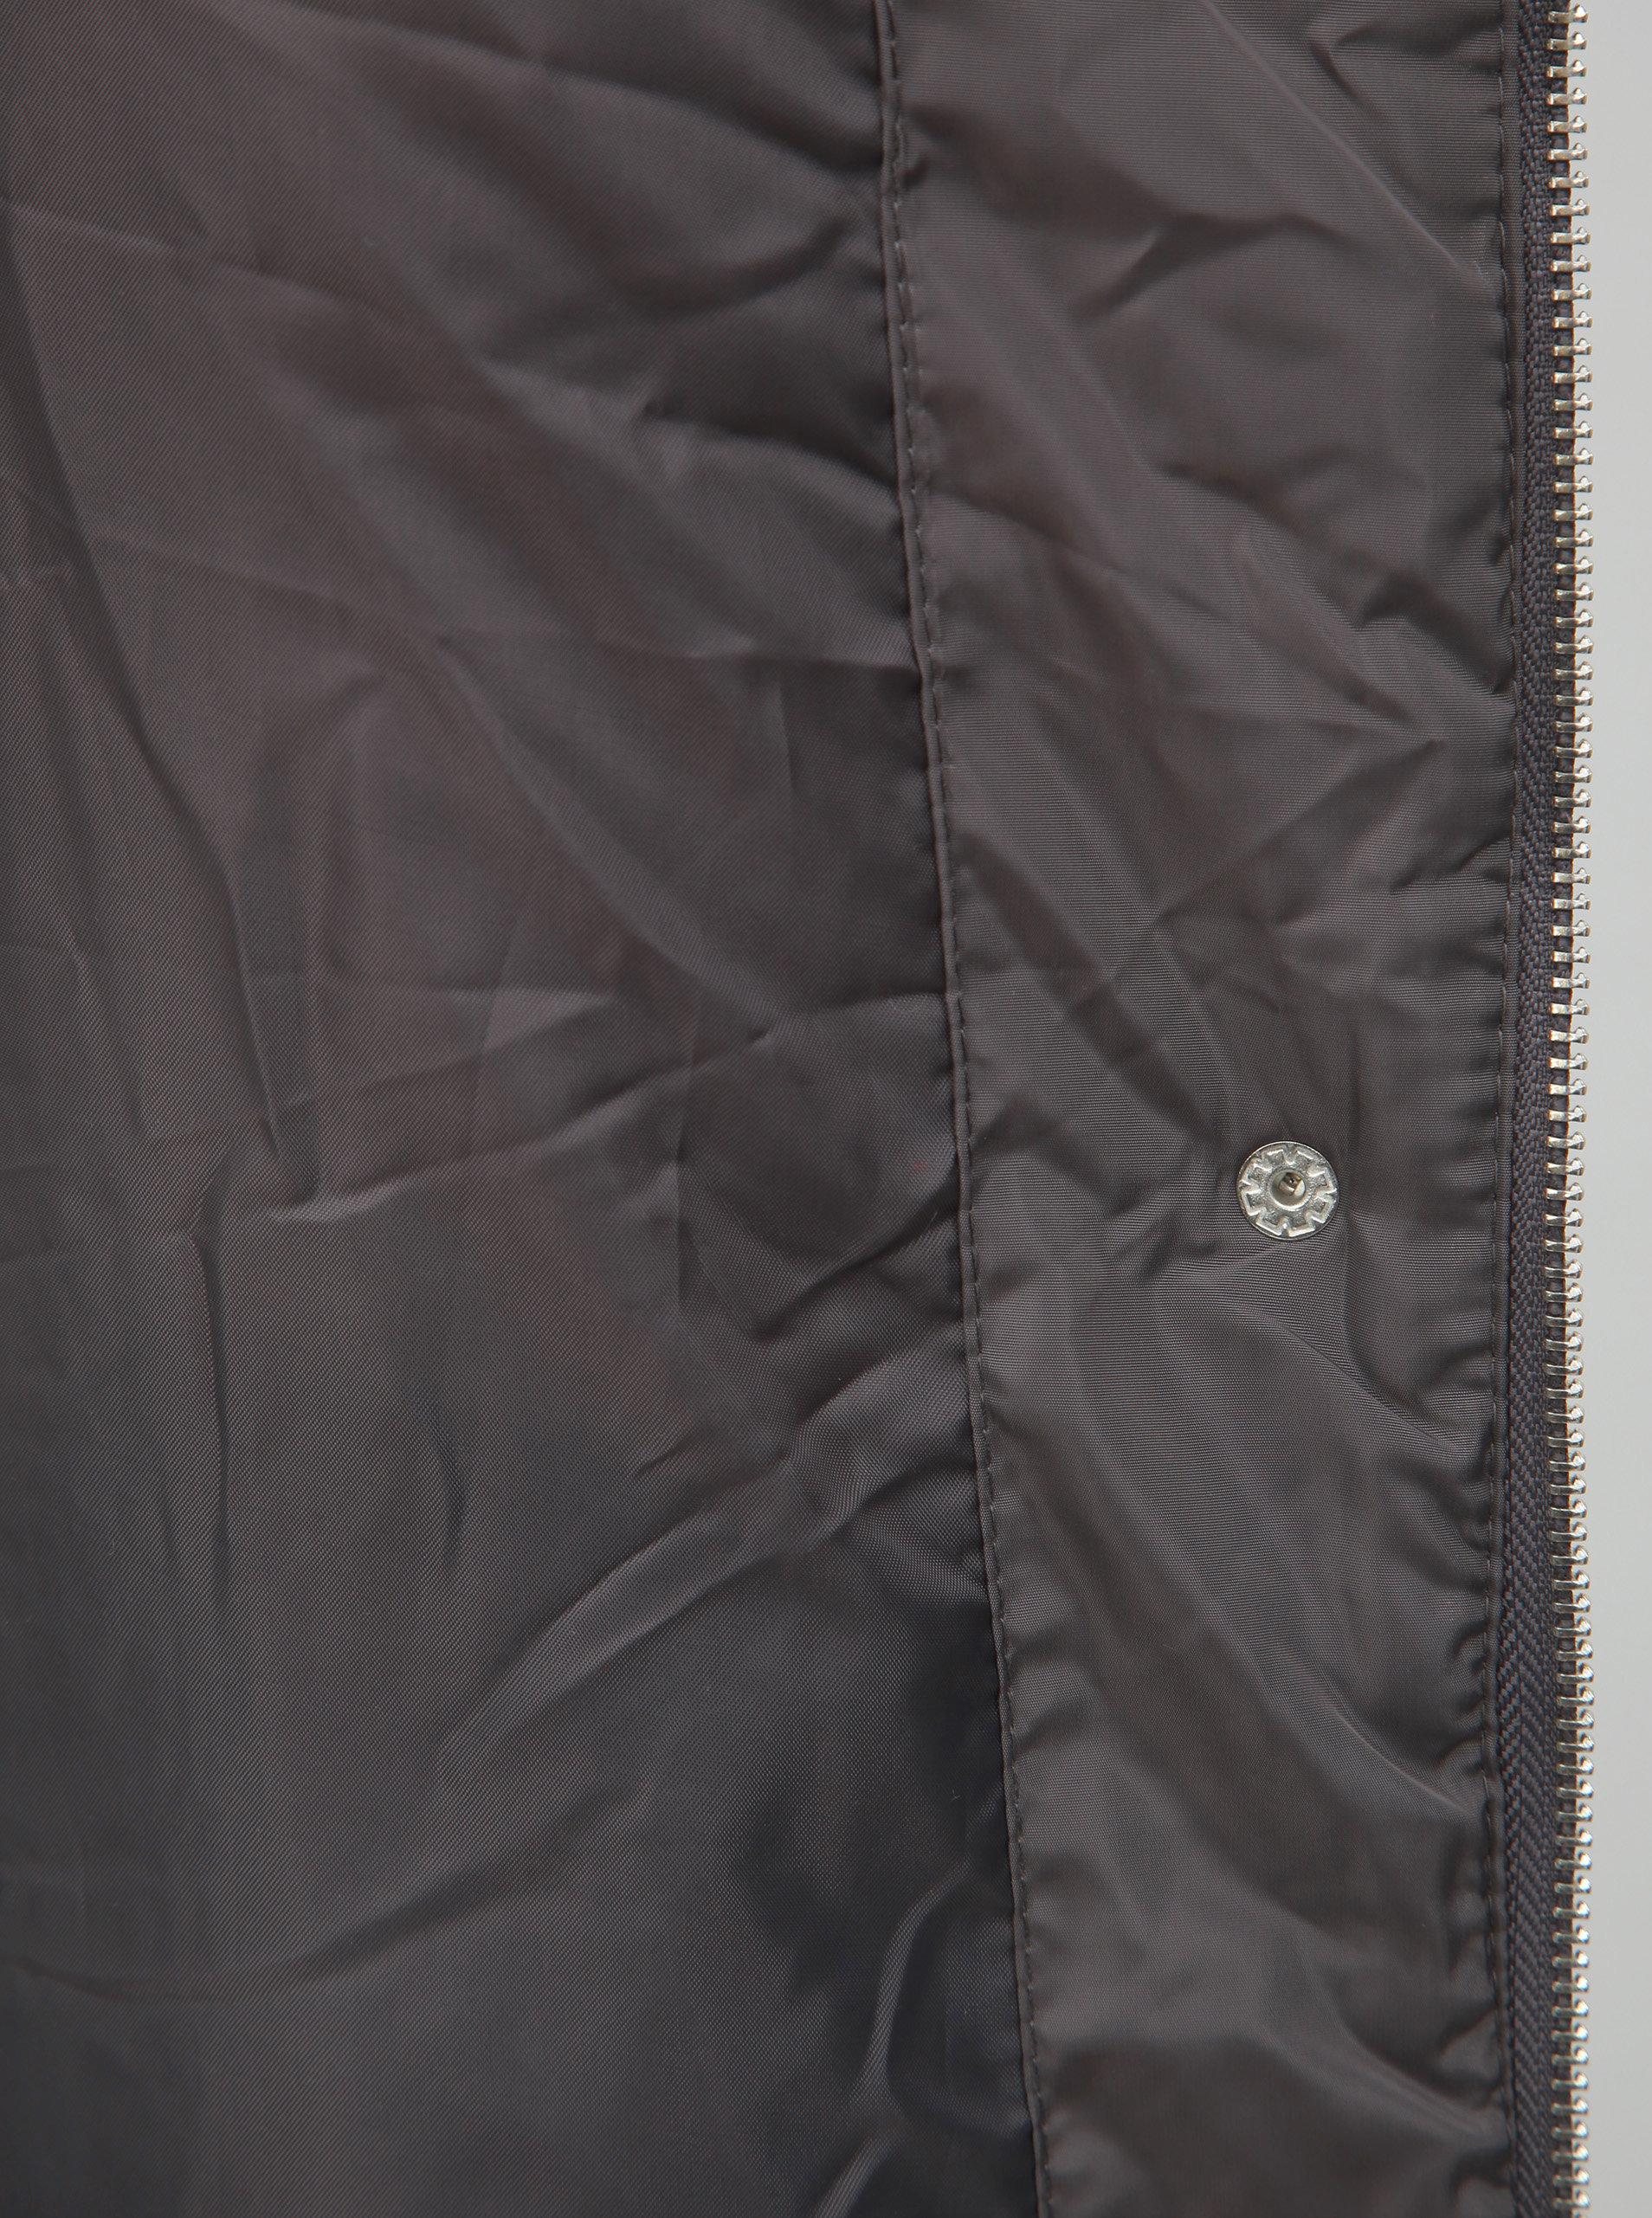 Sivá zimná bunda s odnímateľným golierom z umelej kožušiny Dorothy Perkins  ... b2098a93b25